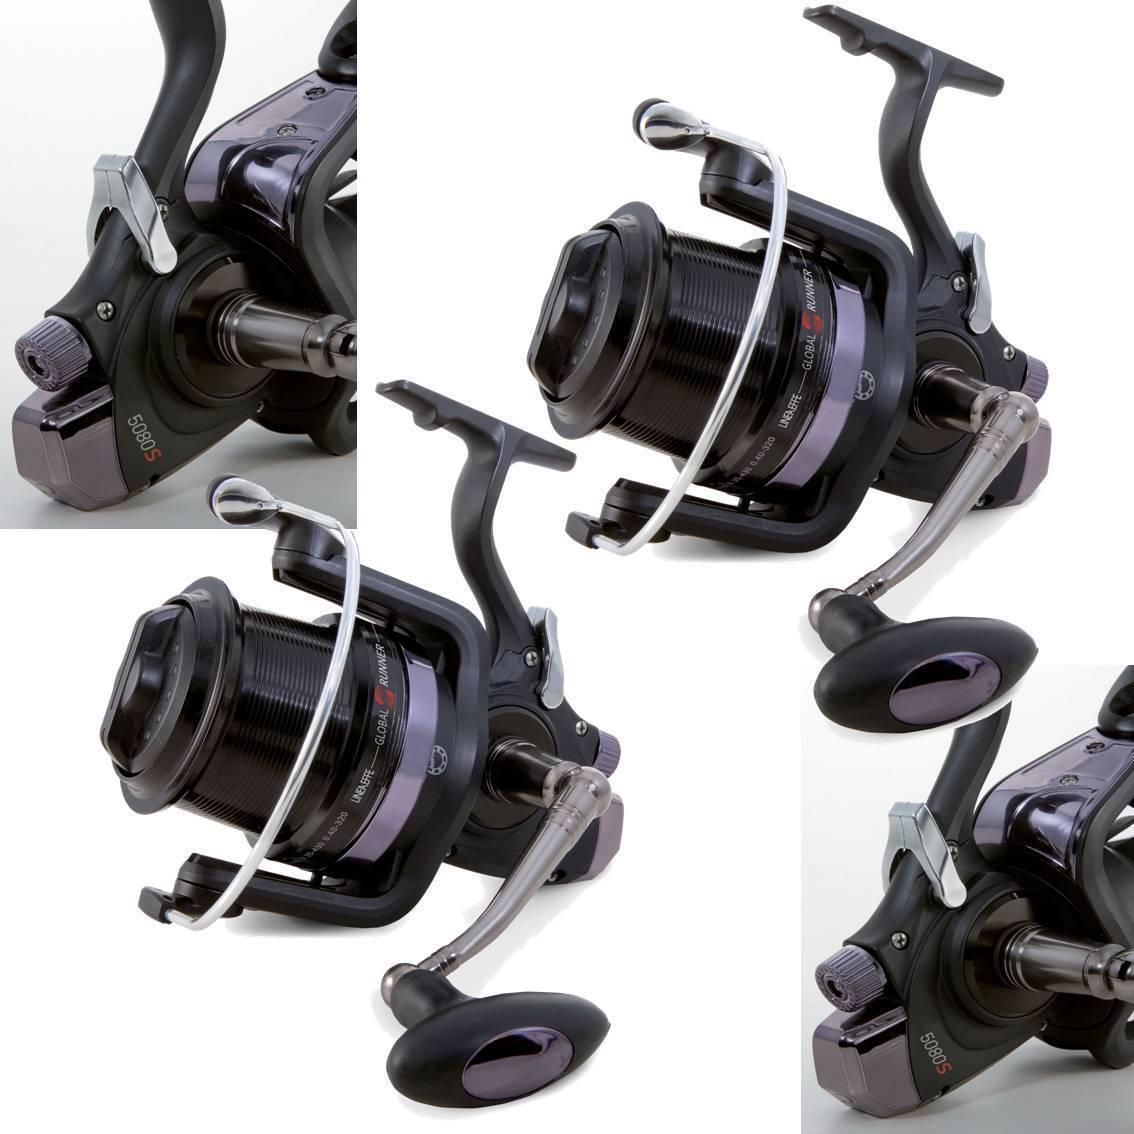 1 x Global Runner 6+1BB Big Pit Large Carp Fishing Reel B-Drag Special System